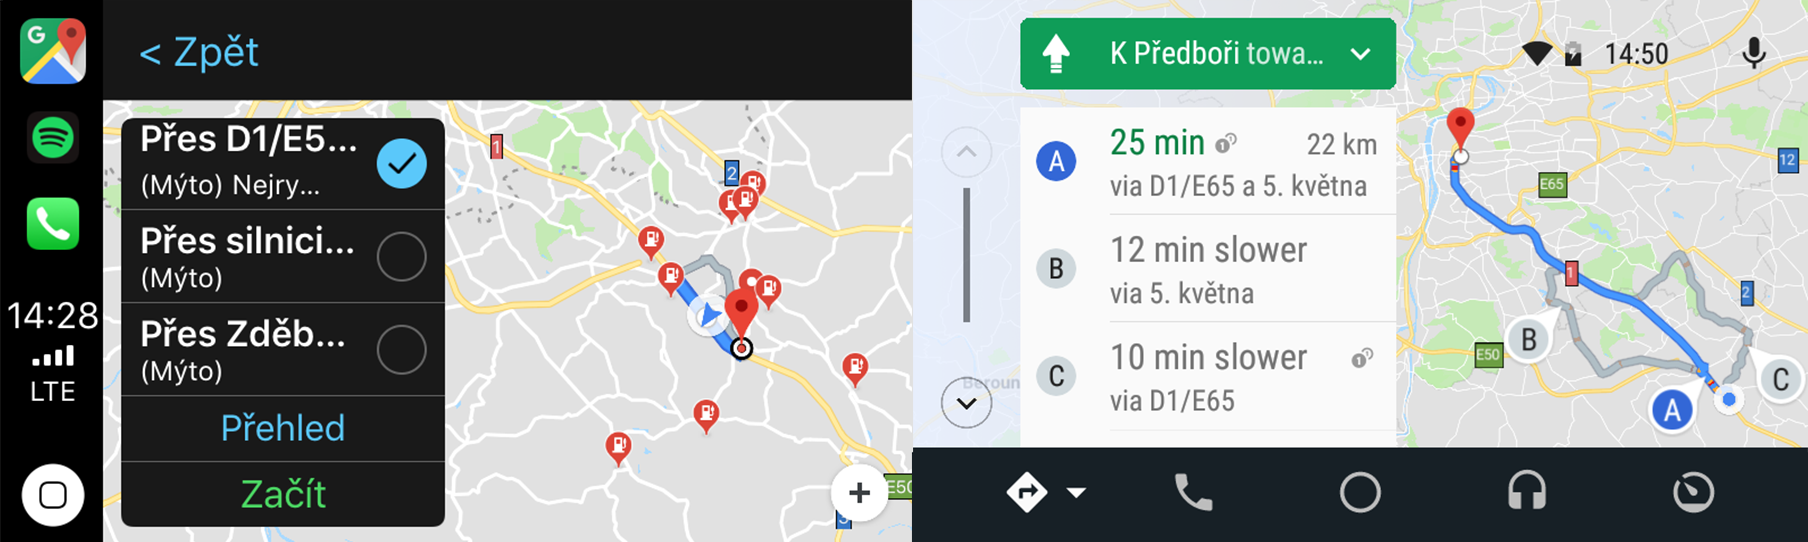 Google Maps - trasa